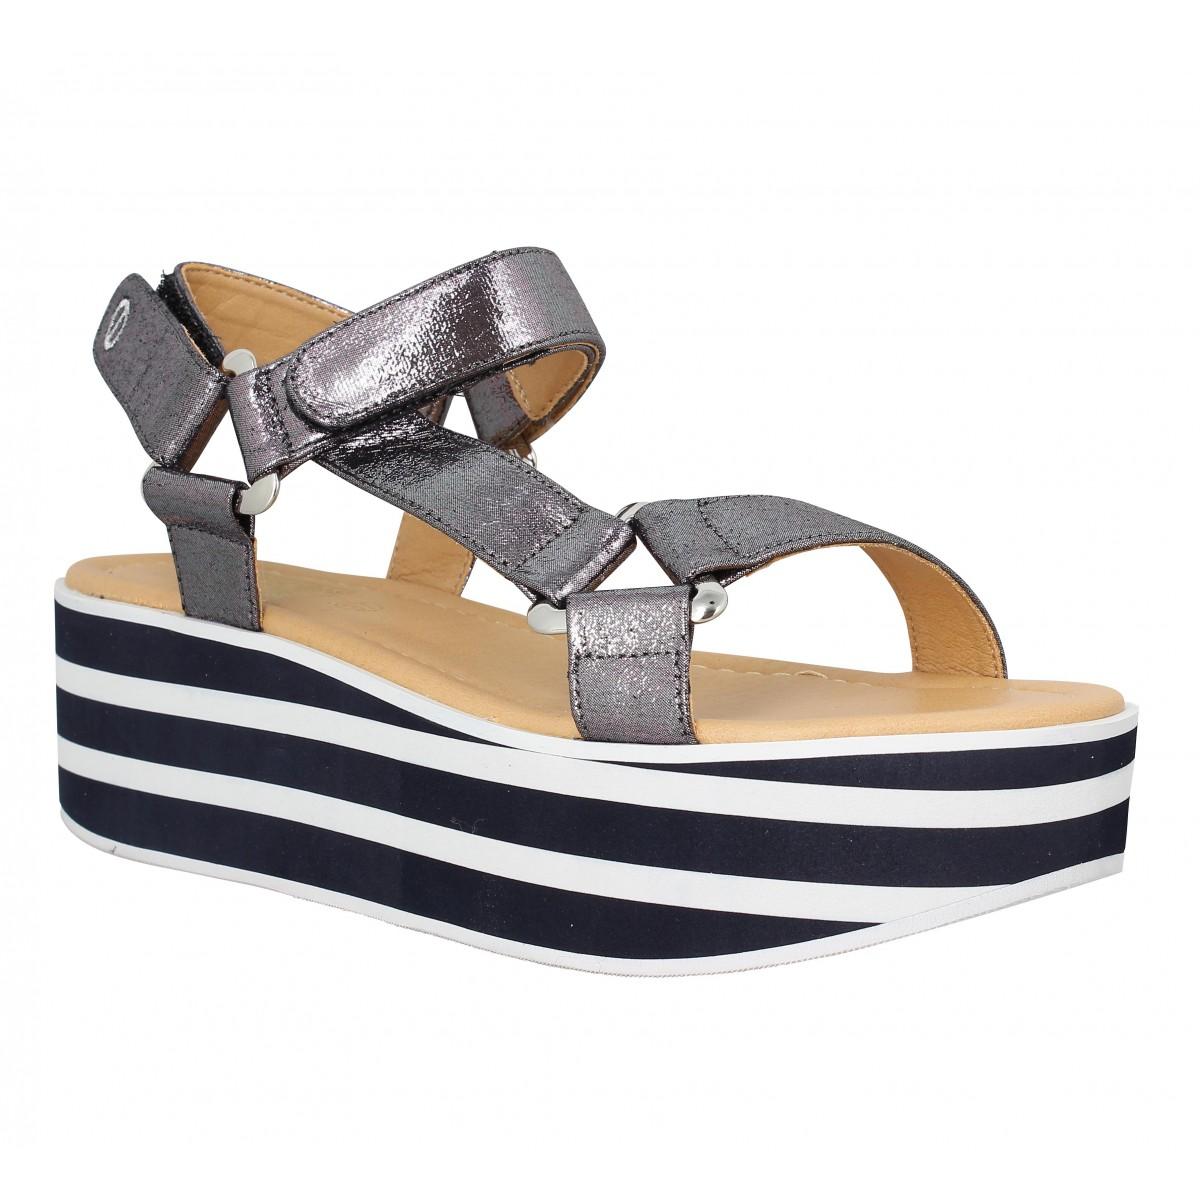 Nu-pieds NO NAME Bahama Sandal Femme Anthracite